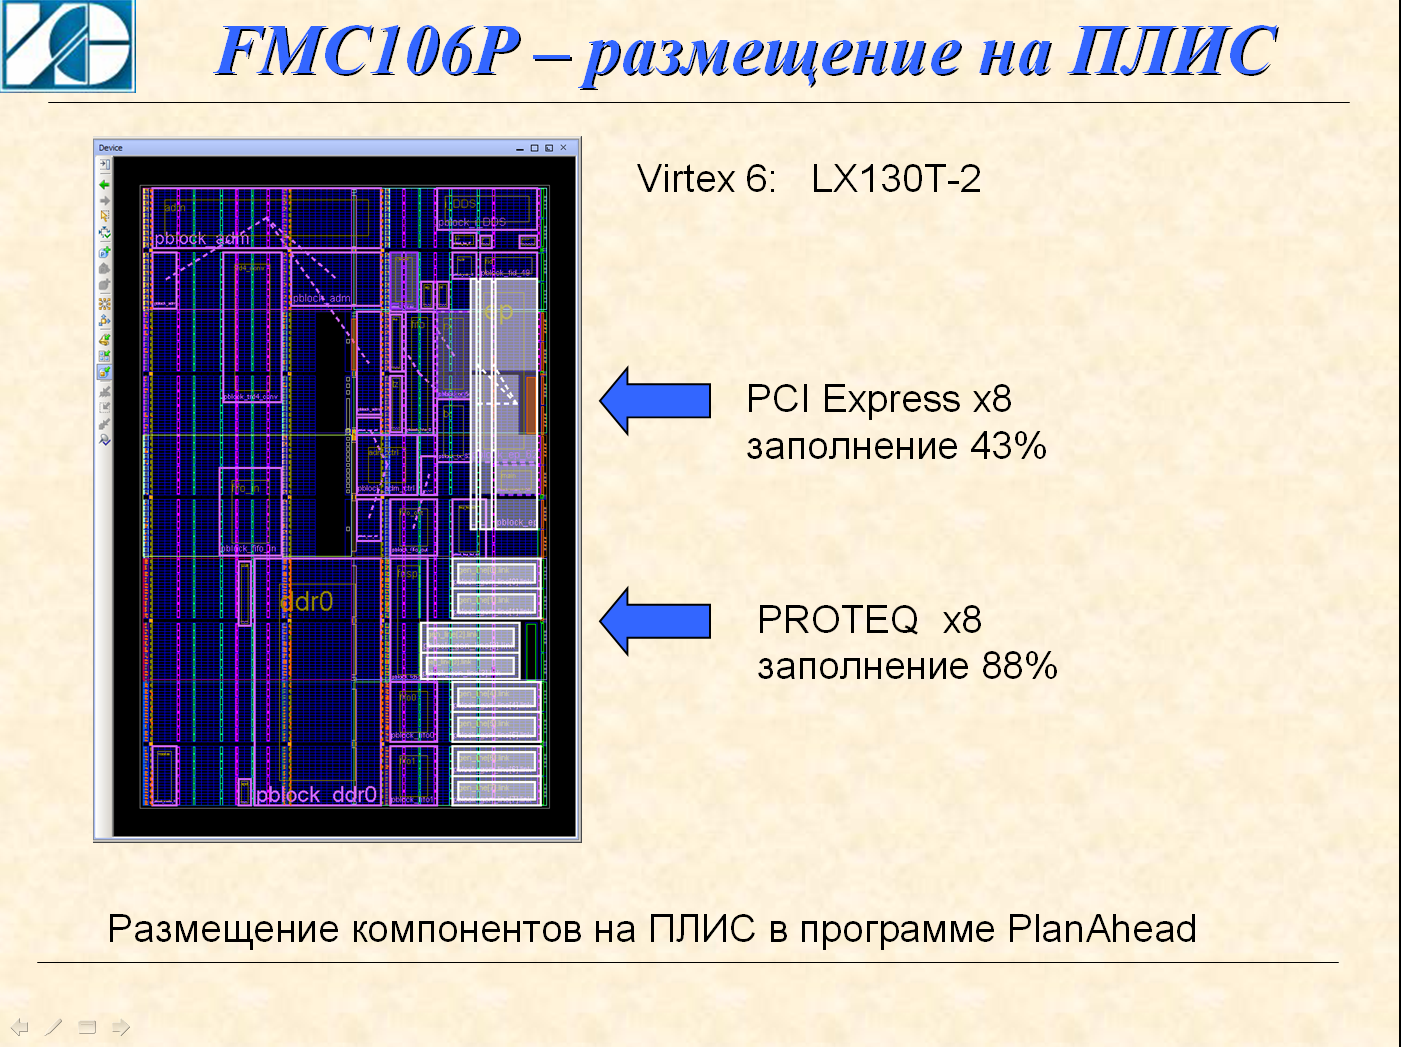 dbf8014d5ced40c5a3897ab34fd4a67f.png